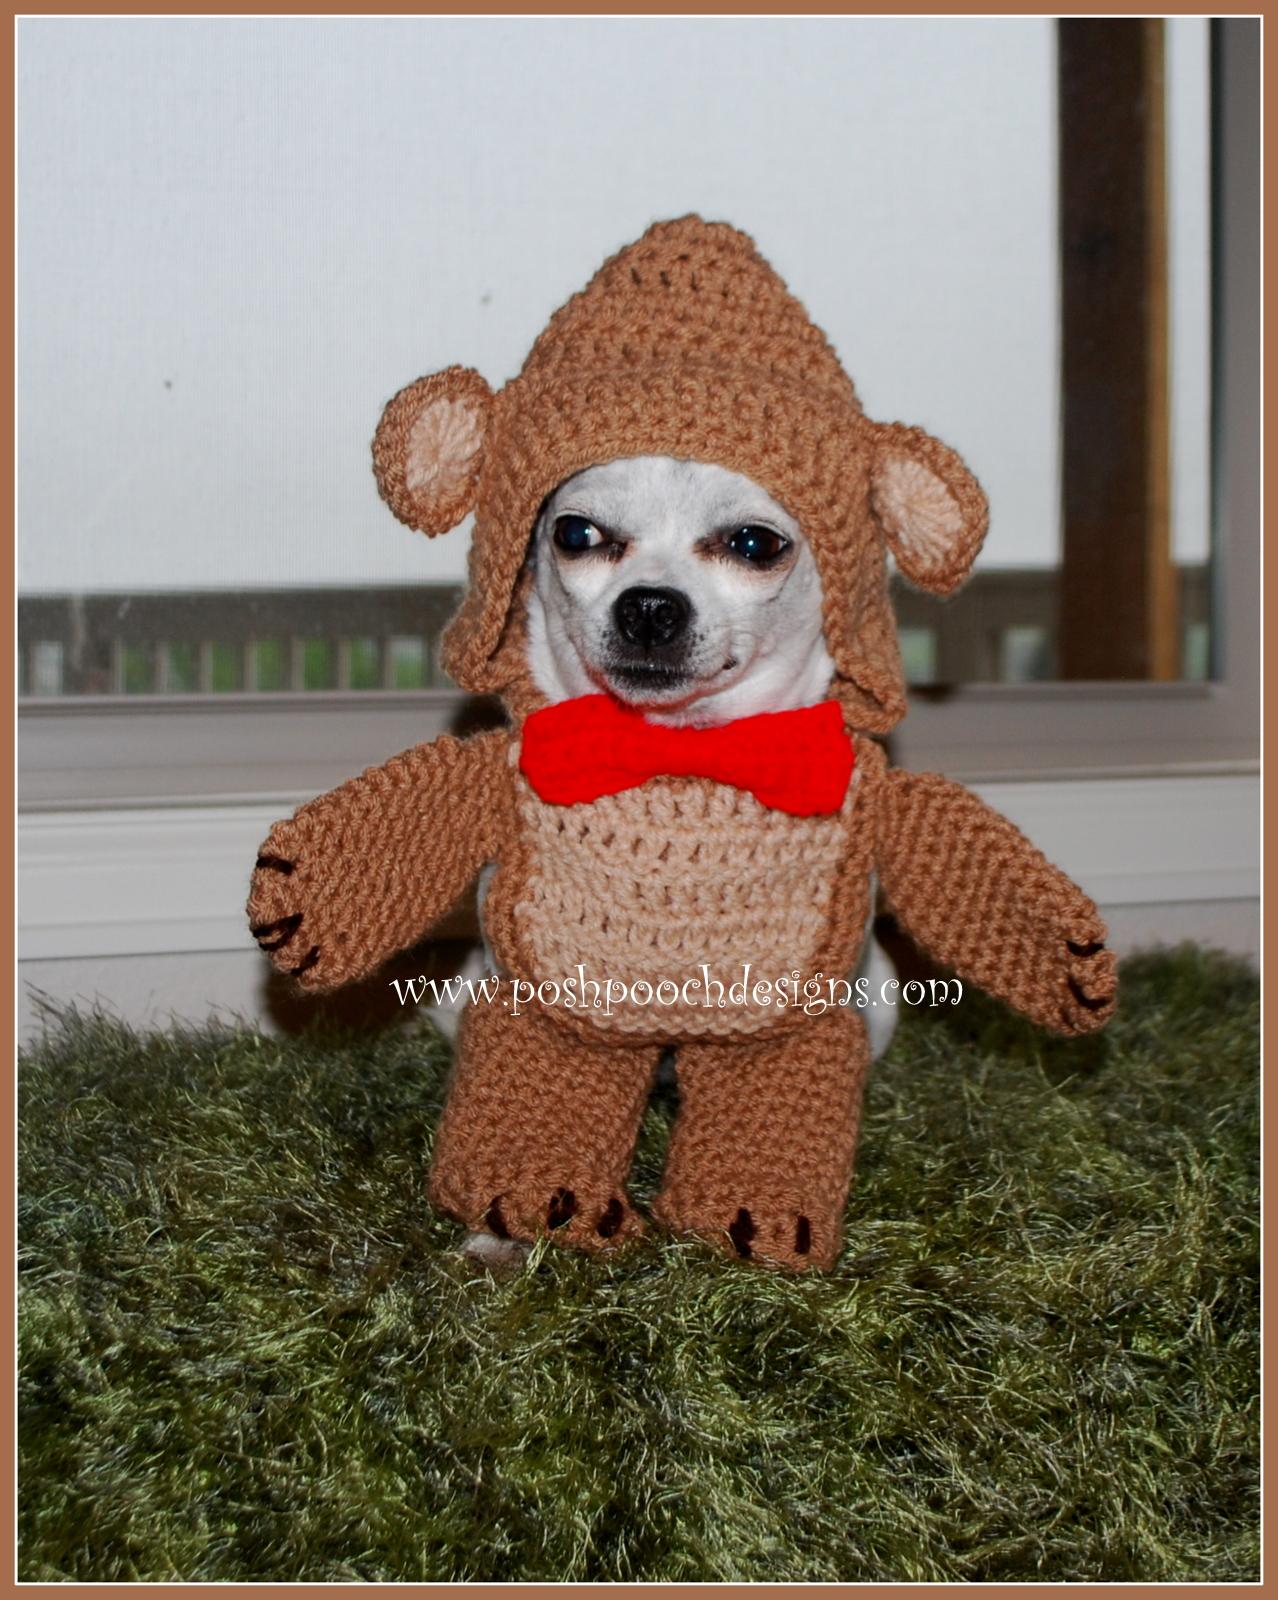 Posh Pooch Designs Dog Clothes: Walking Bear Dog Costume ...